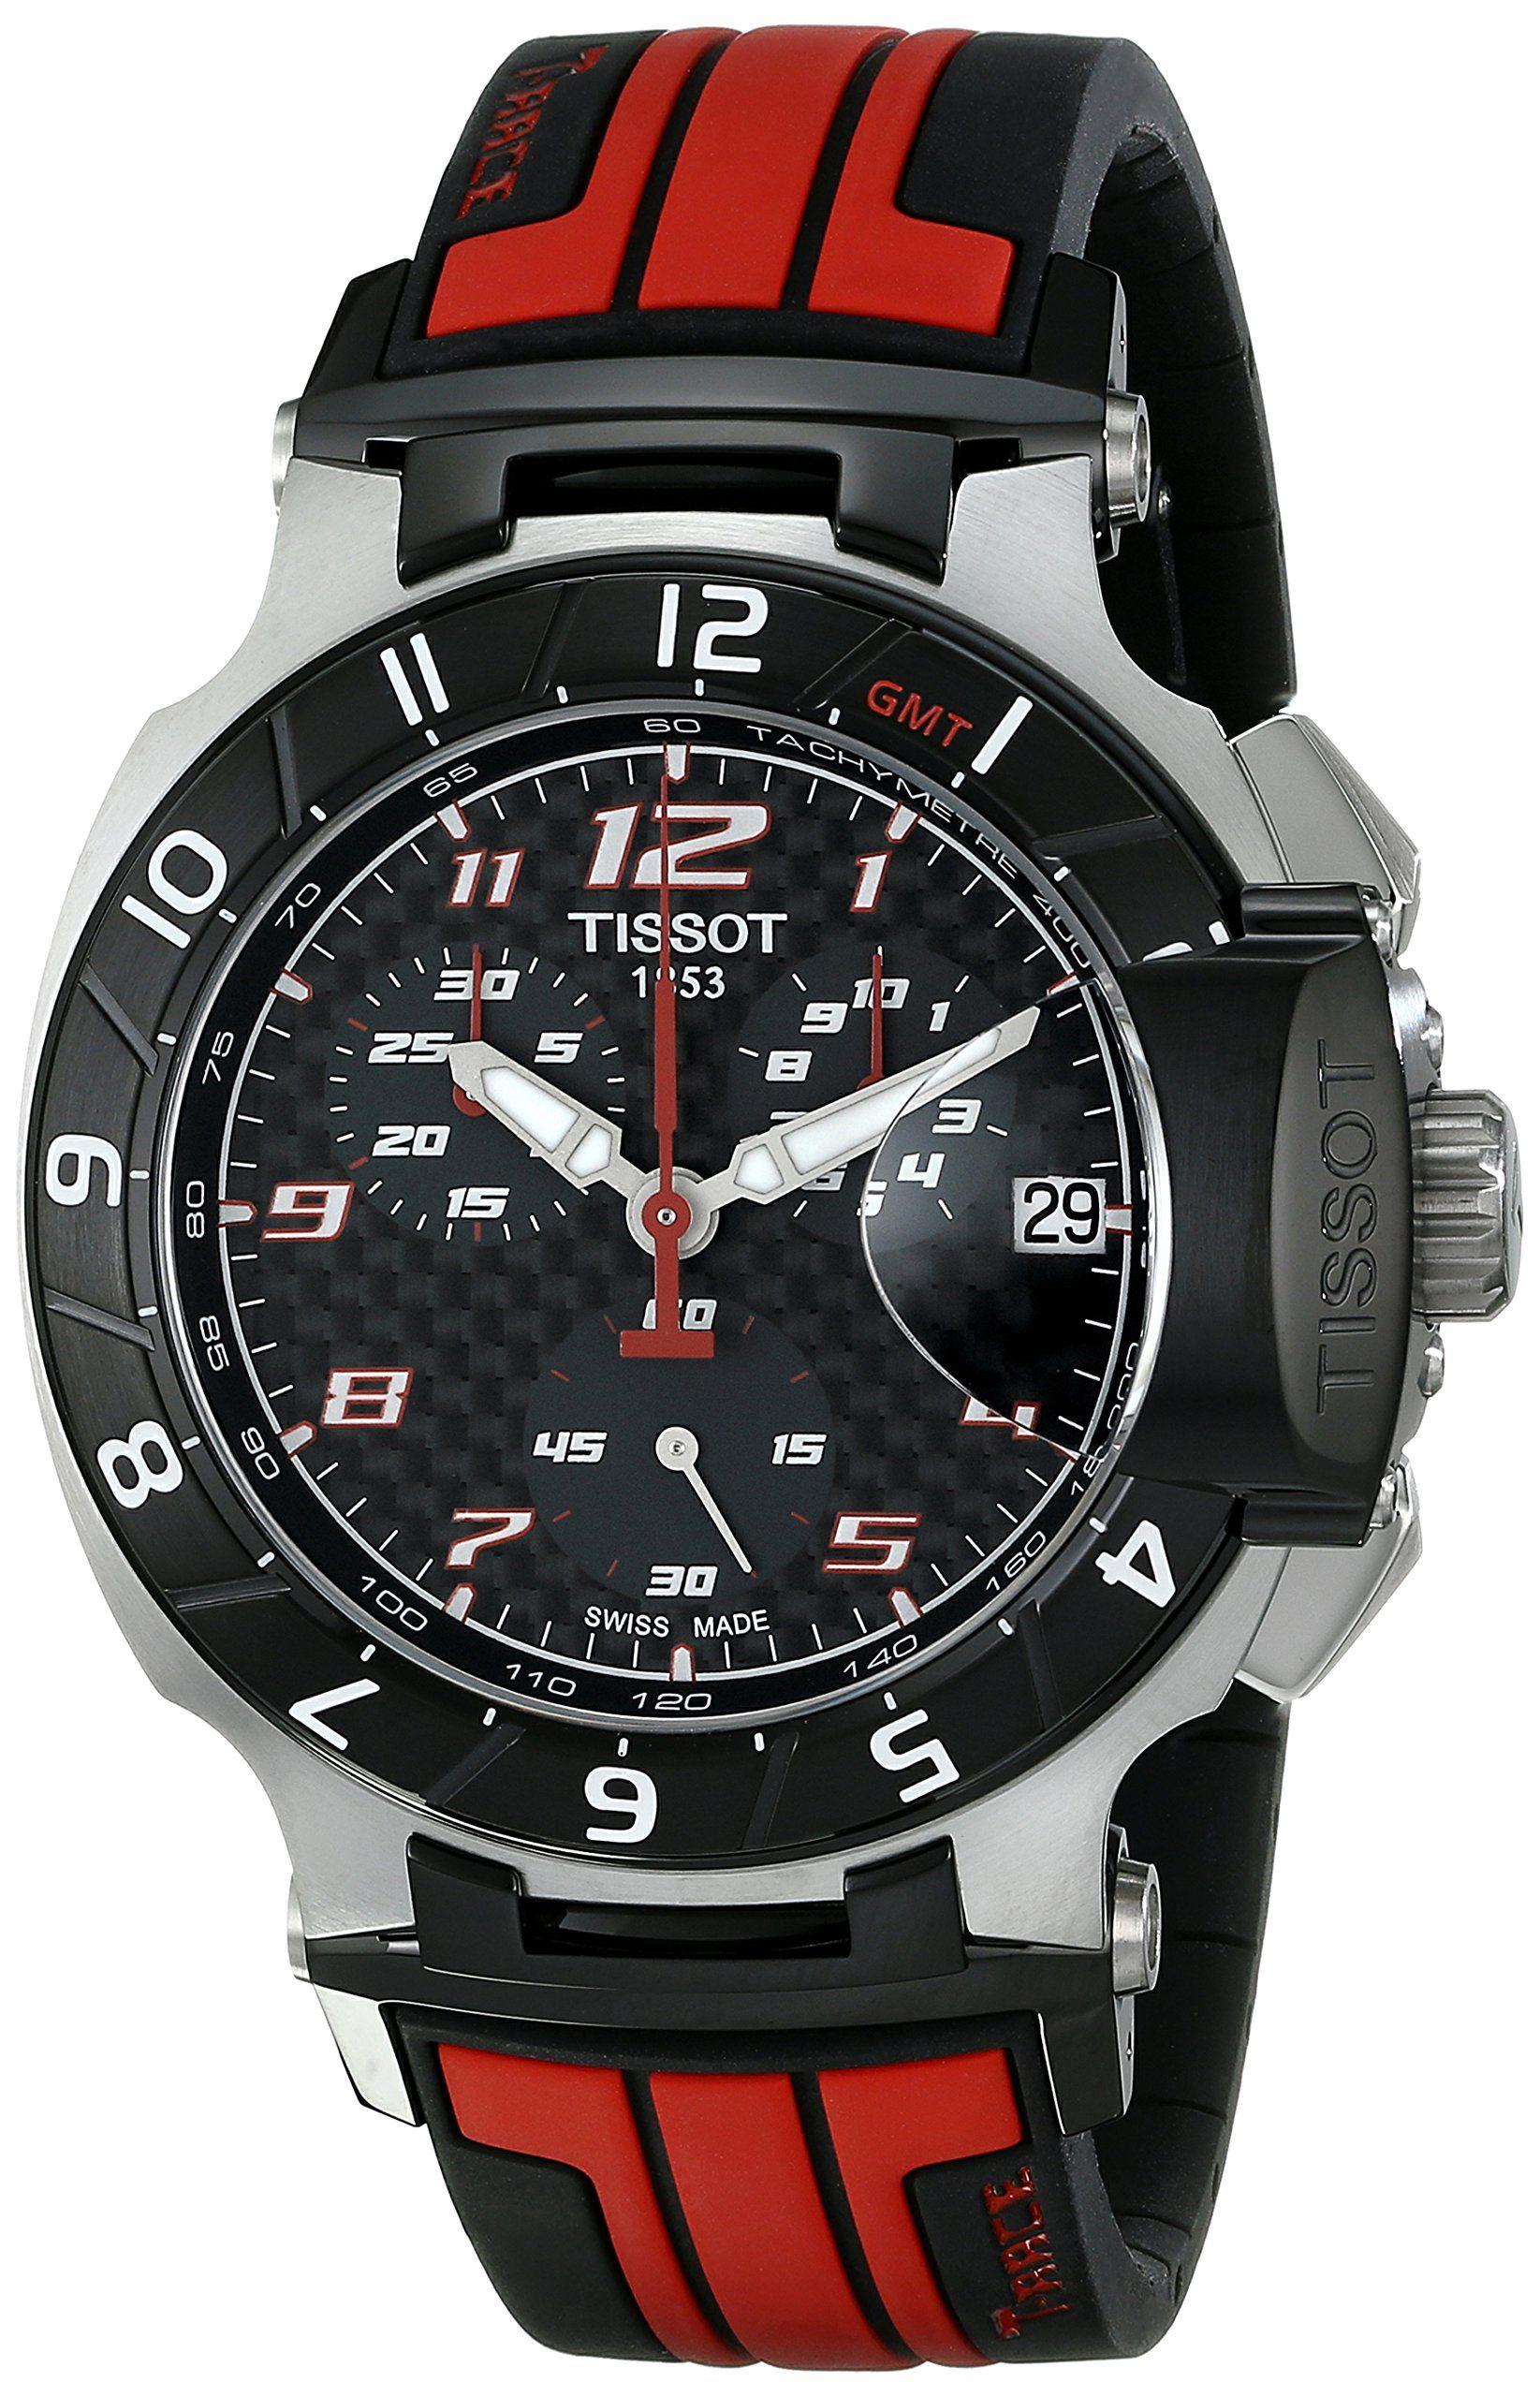 Tissot Men's T-Race MotoGP Limited Edition Analog Display Swiss Quartz Red Watches